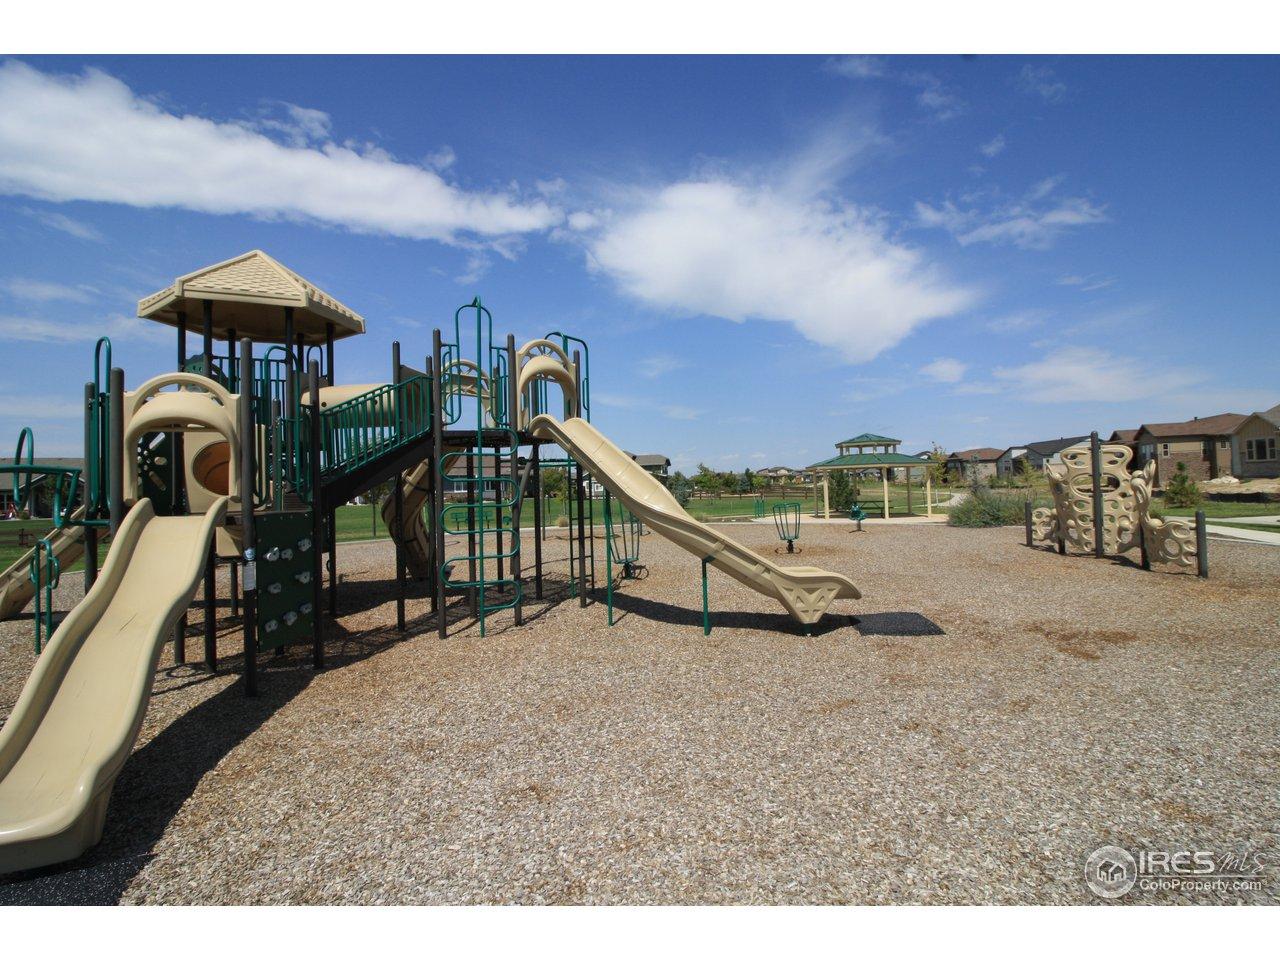 Very nice community park